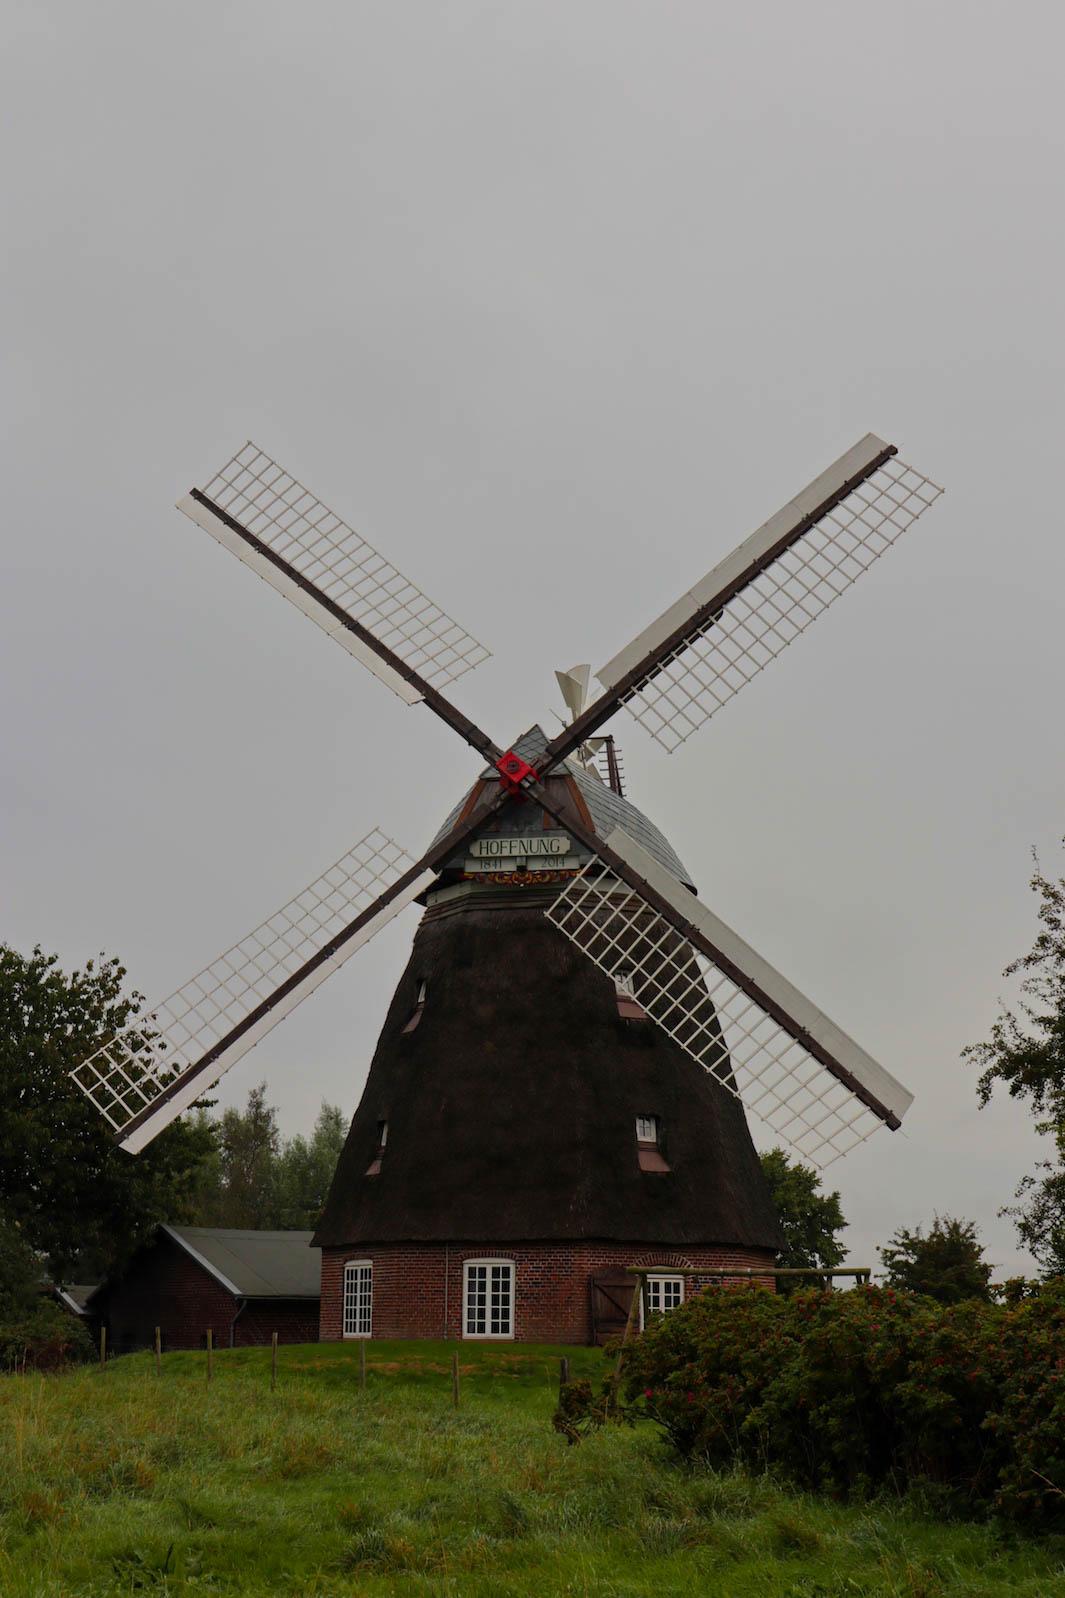 Windmühle am Wegesrand